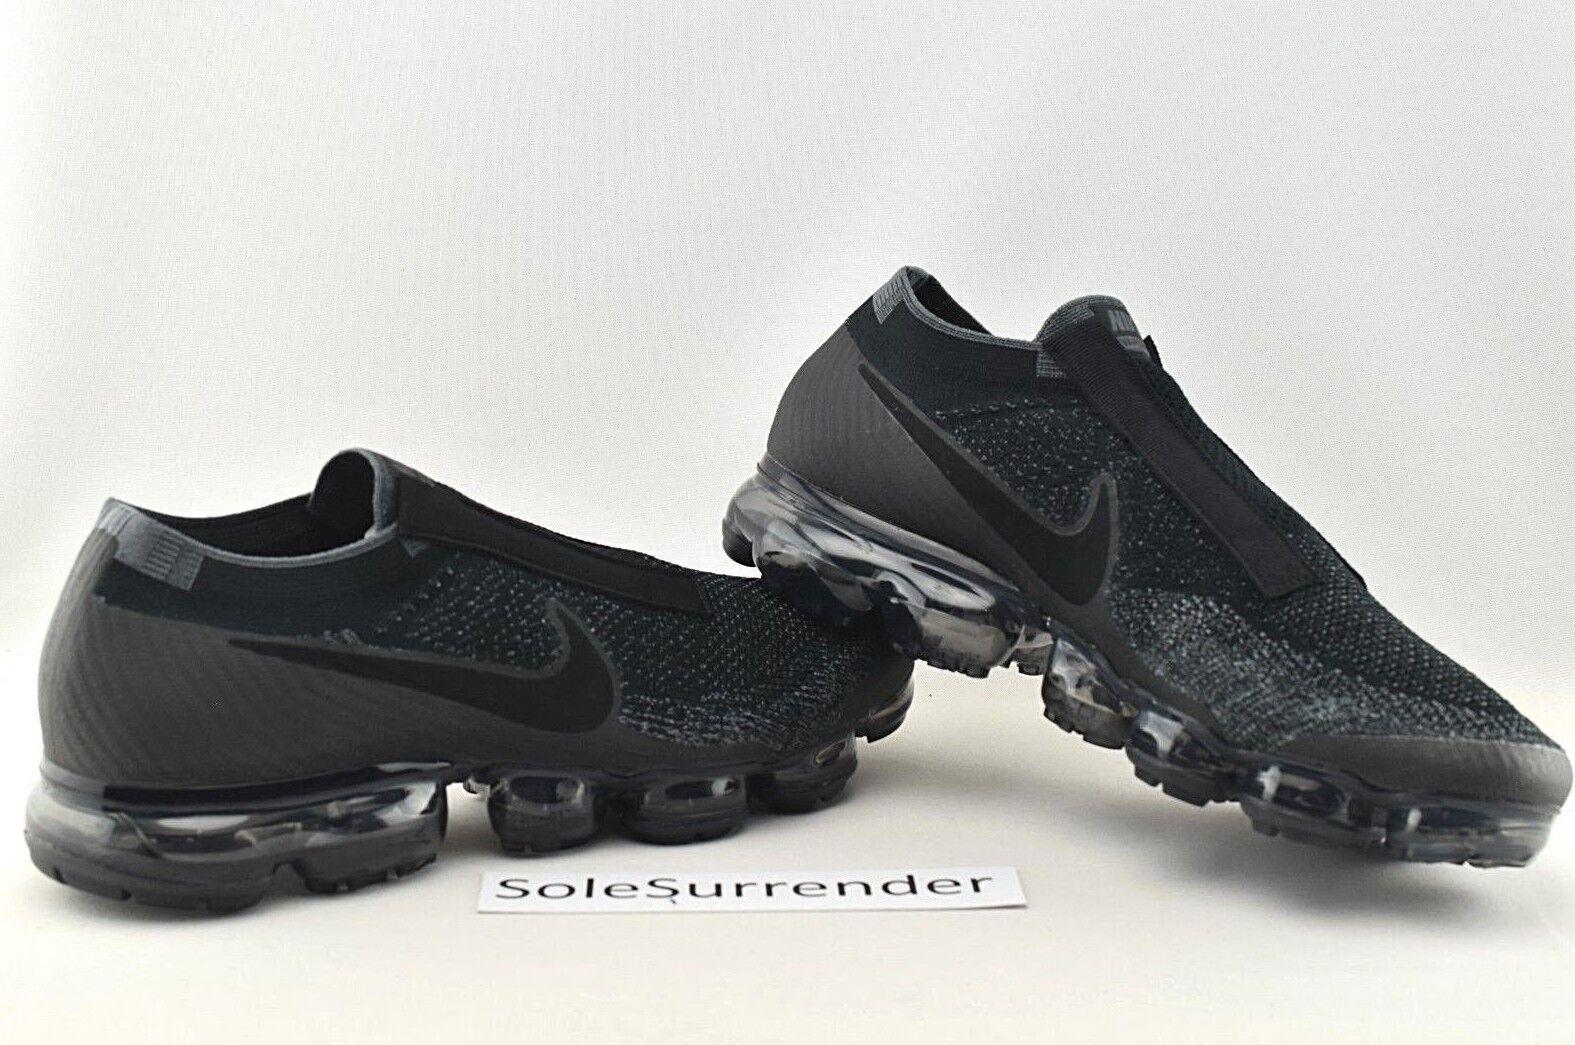 284c66ff8cc Nike Air Vapormax Flyknit SE Laceless Black DK Grey Aq0581 001 Sz ...